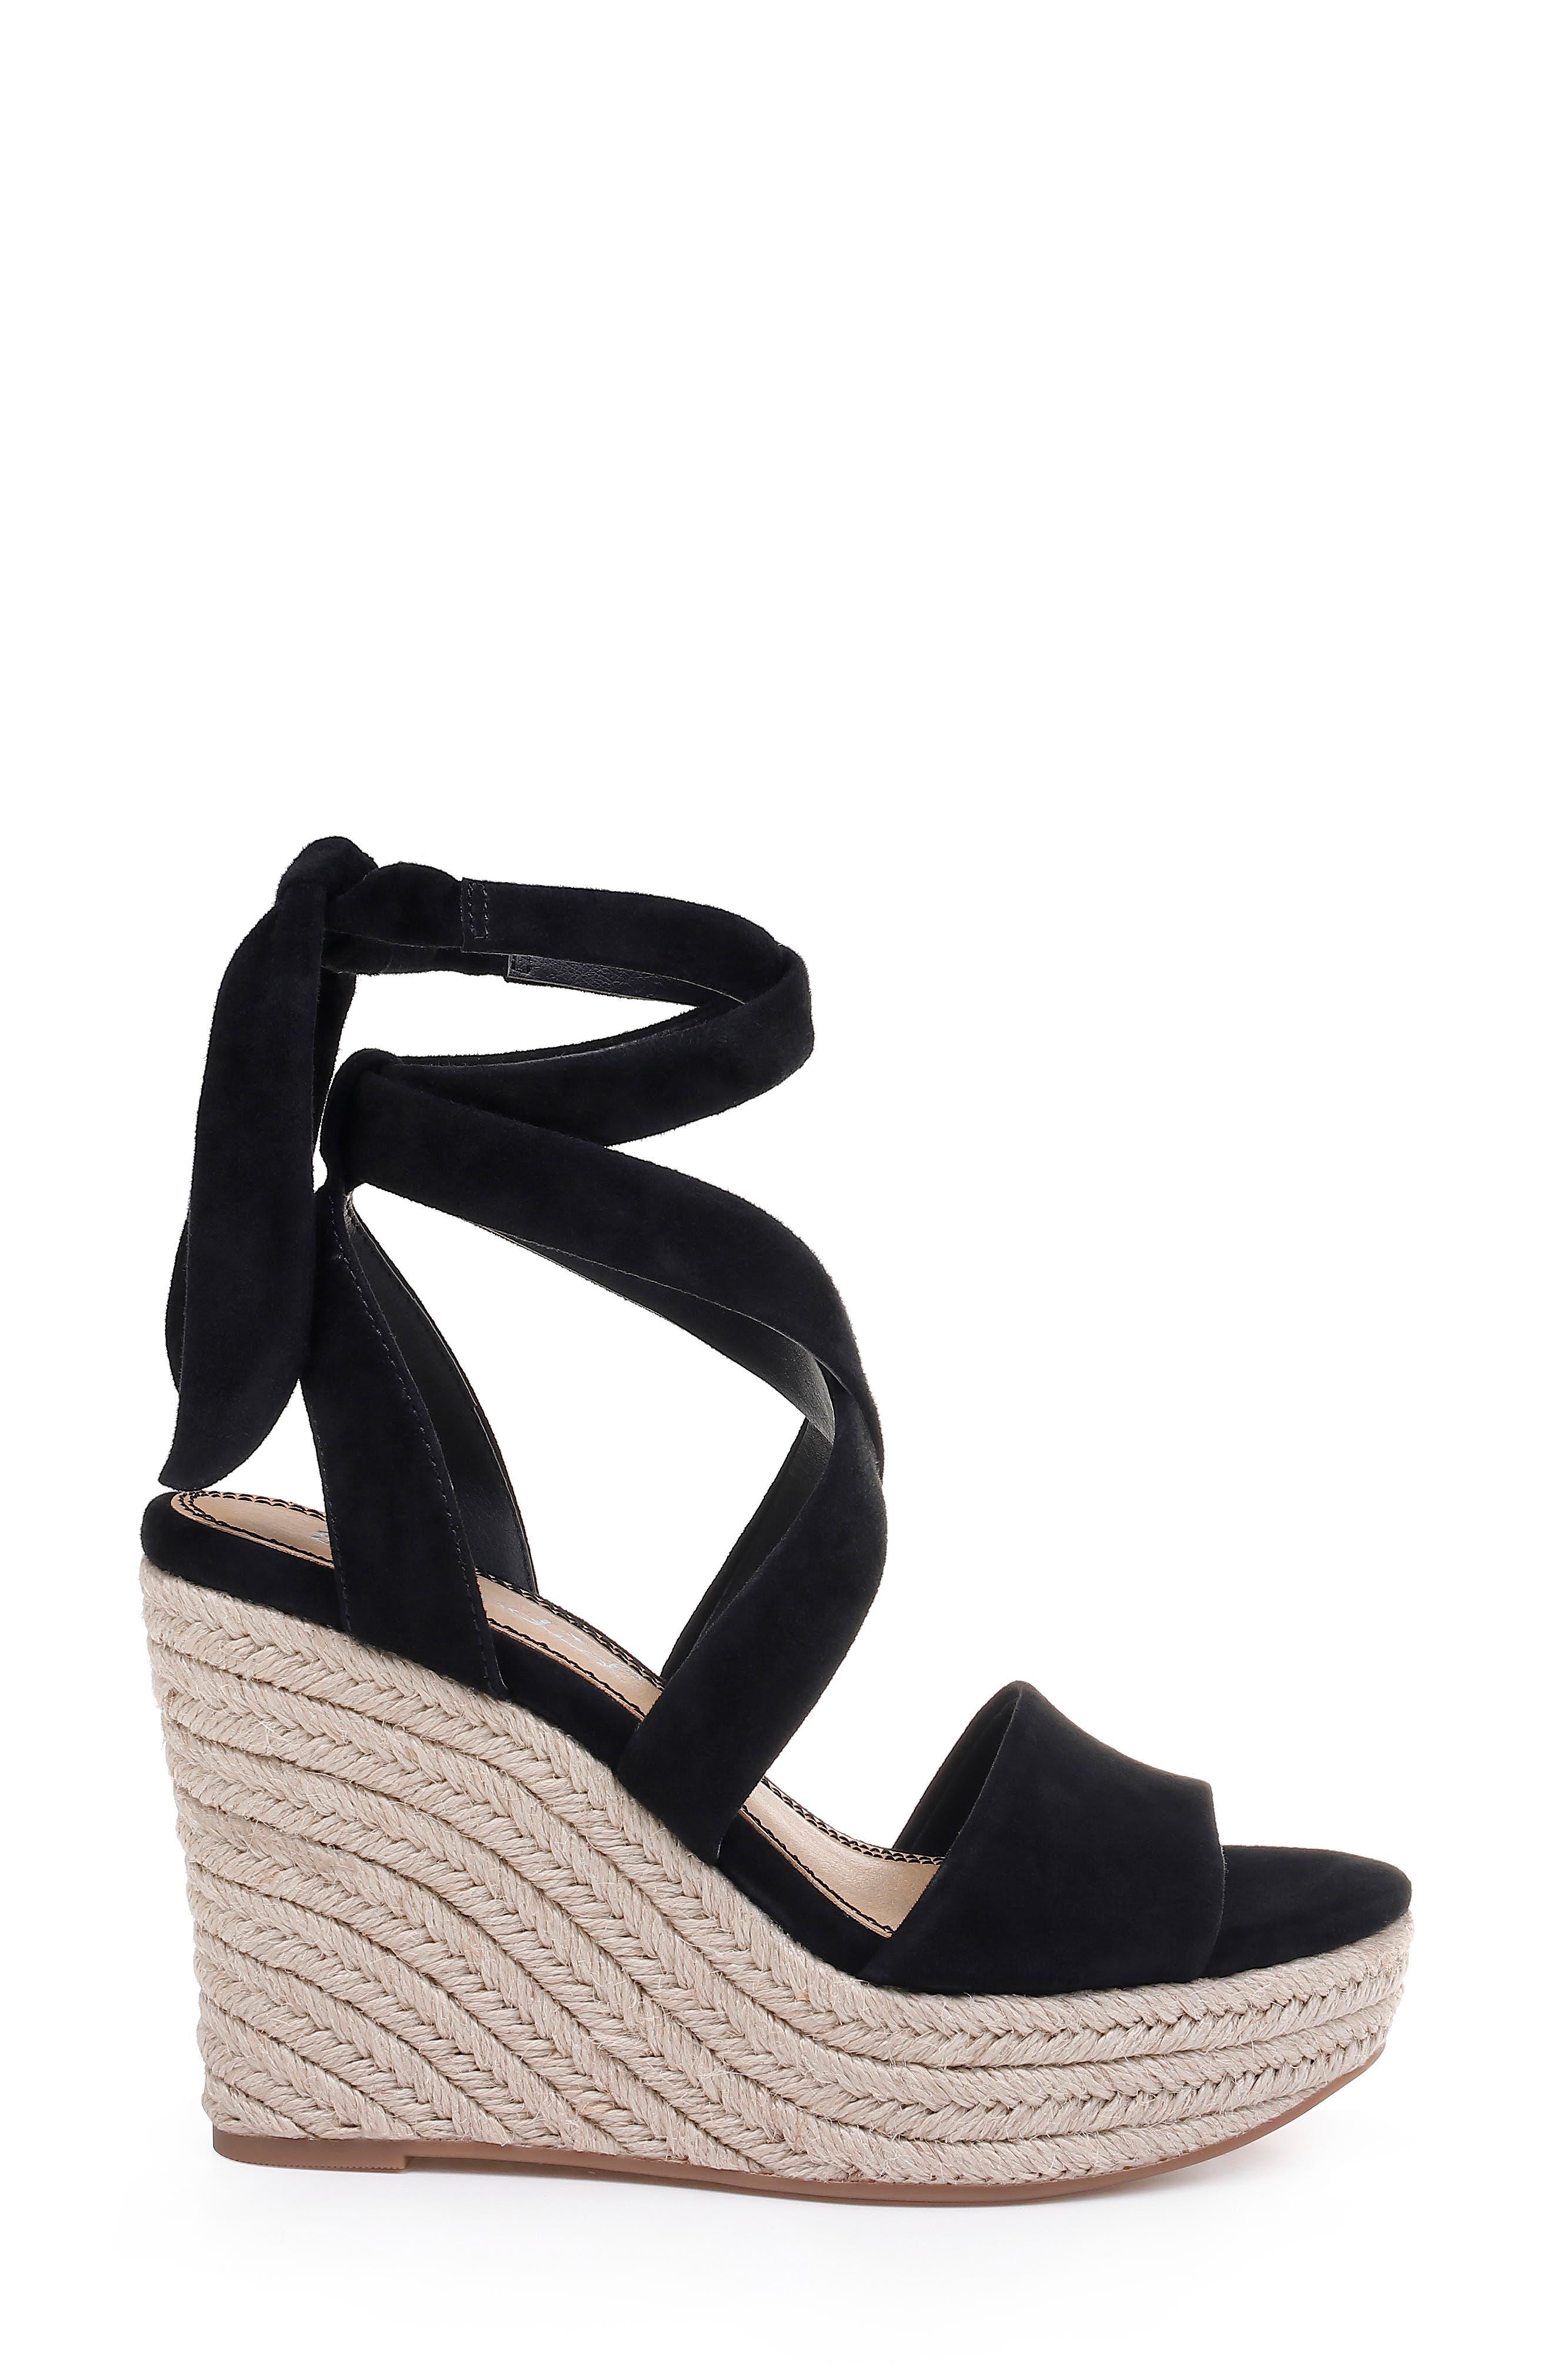 SPLENDID, Tessie Ankle Wrap Wedge Sandal, Alternate thumbnail 3, color, BLACK SUEDE